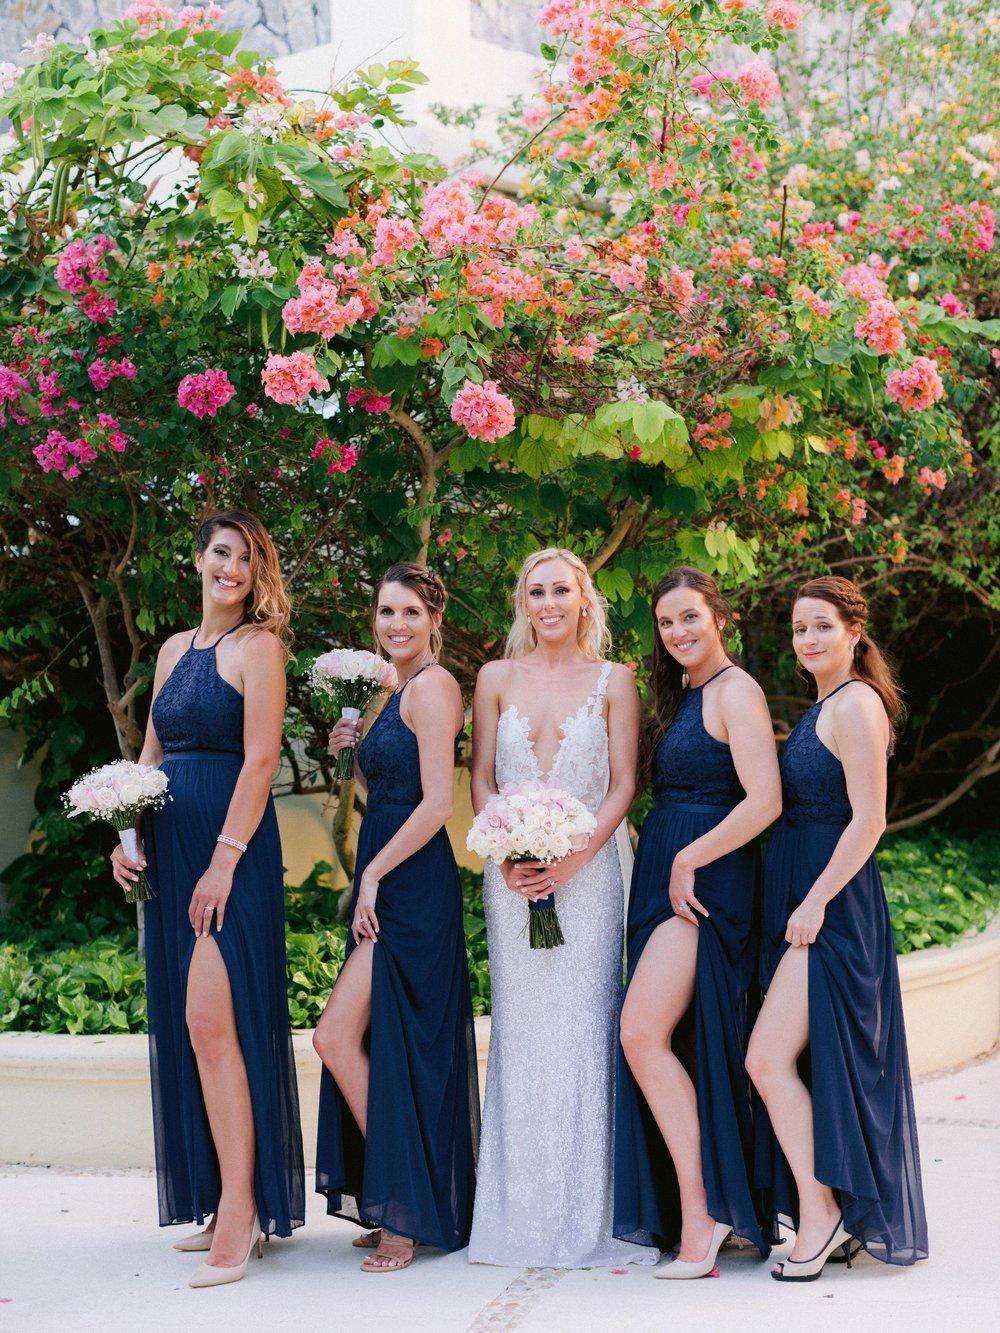 Kim_Jeff_Cancun Wedding_Portraits_Kurtz_Orpia (95 of 178).jpg